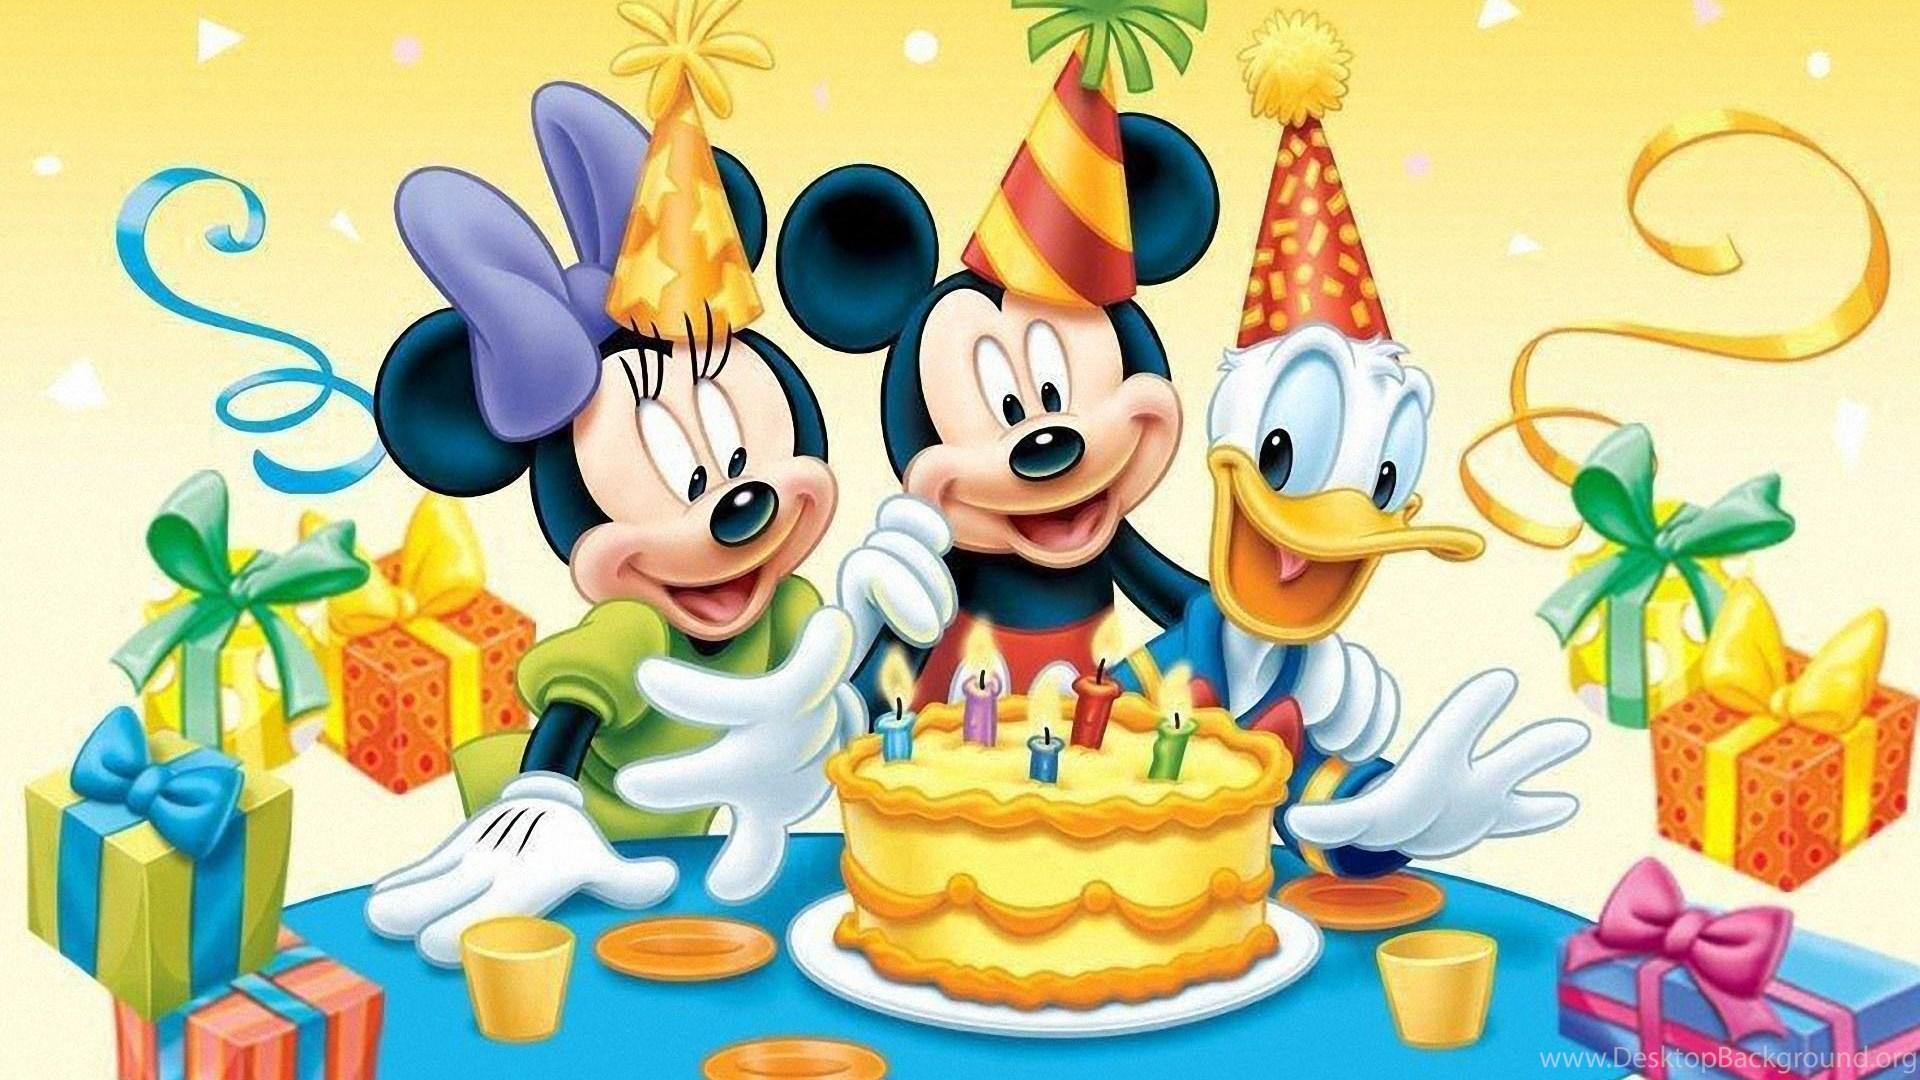 High Resolution Disney Cartoon Mickey Mouse Wallpapers Hd 11 Desktop Background